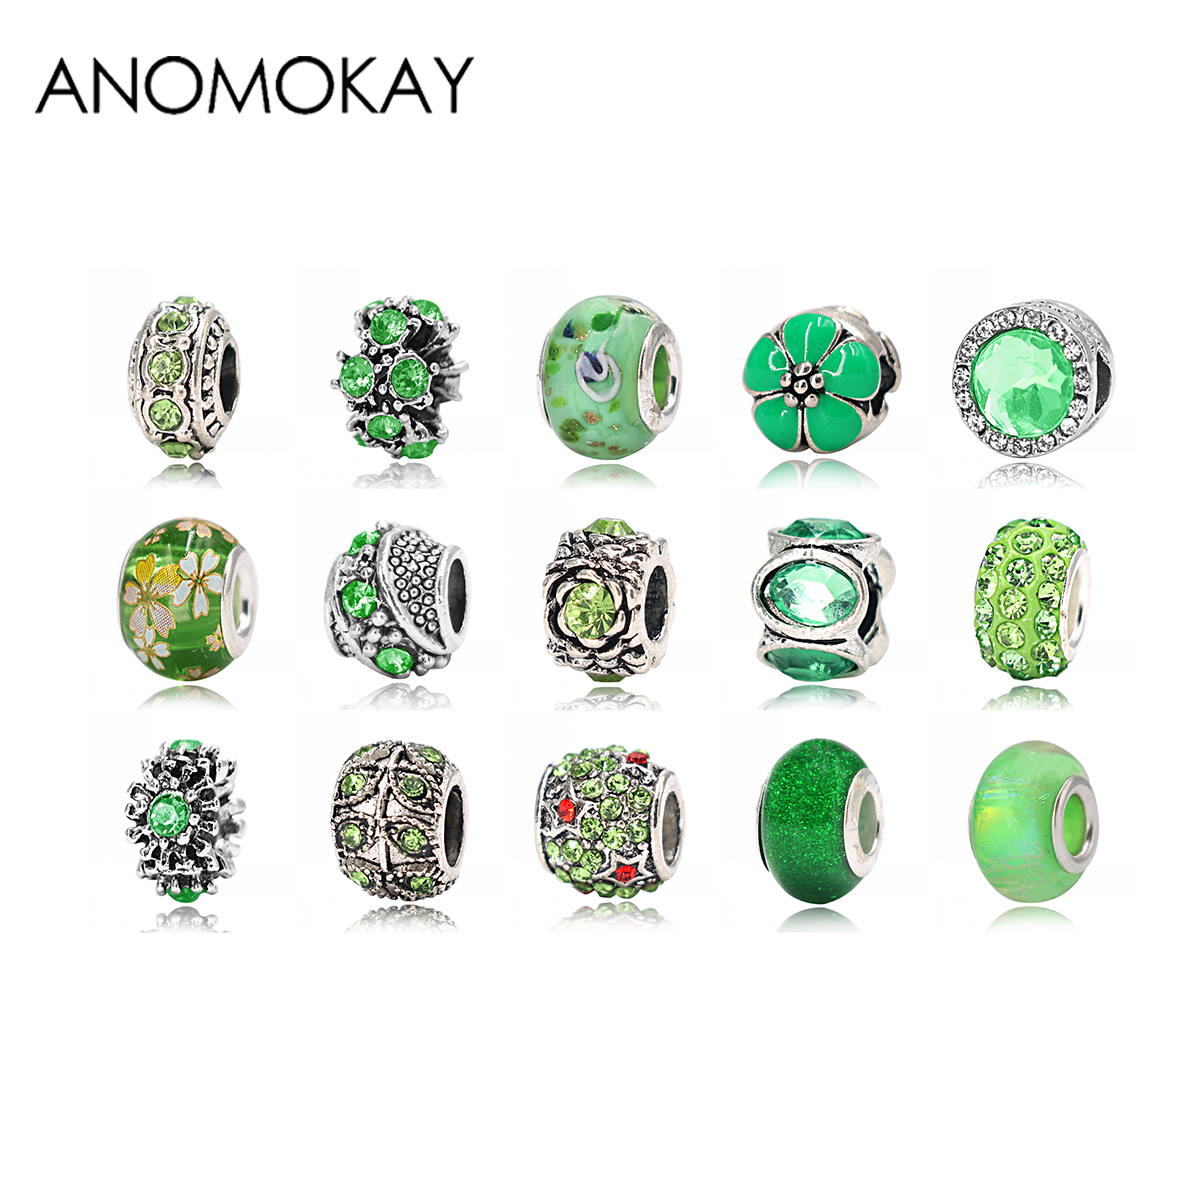 ANOMOKAY 2PCS/LOT Green Style Crystal Enamal Bead fit Pandora Bracelet Leaf Charms for DIY Jewelry Marking for Women Gift